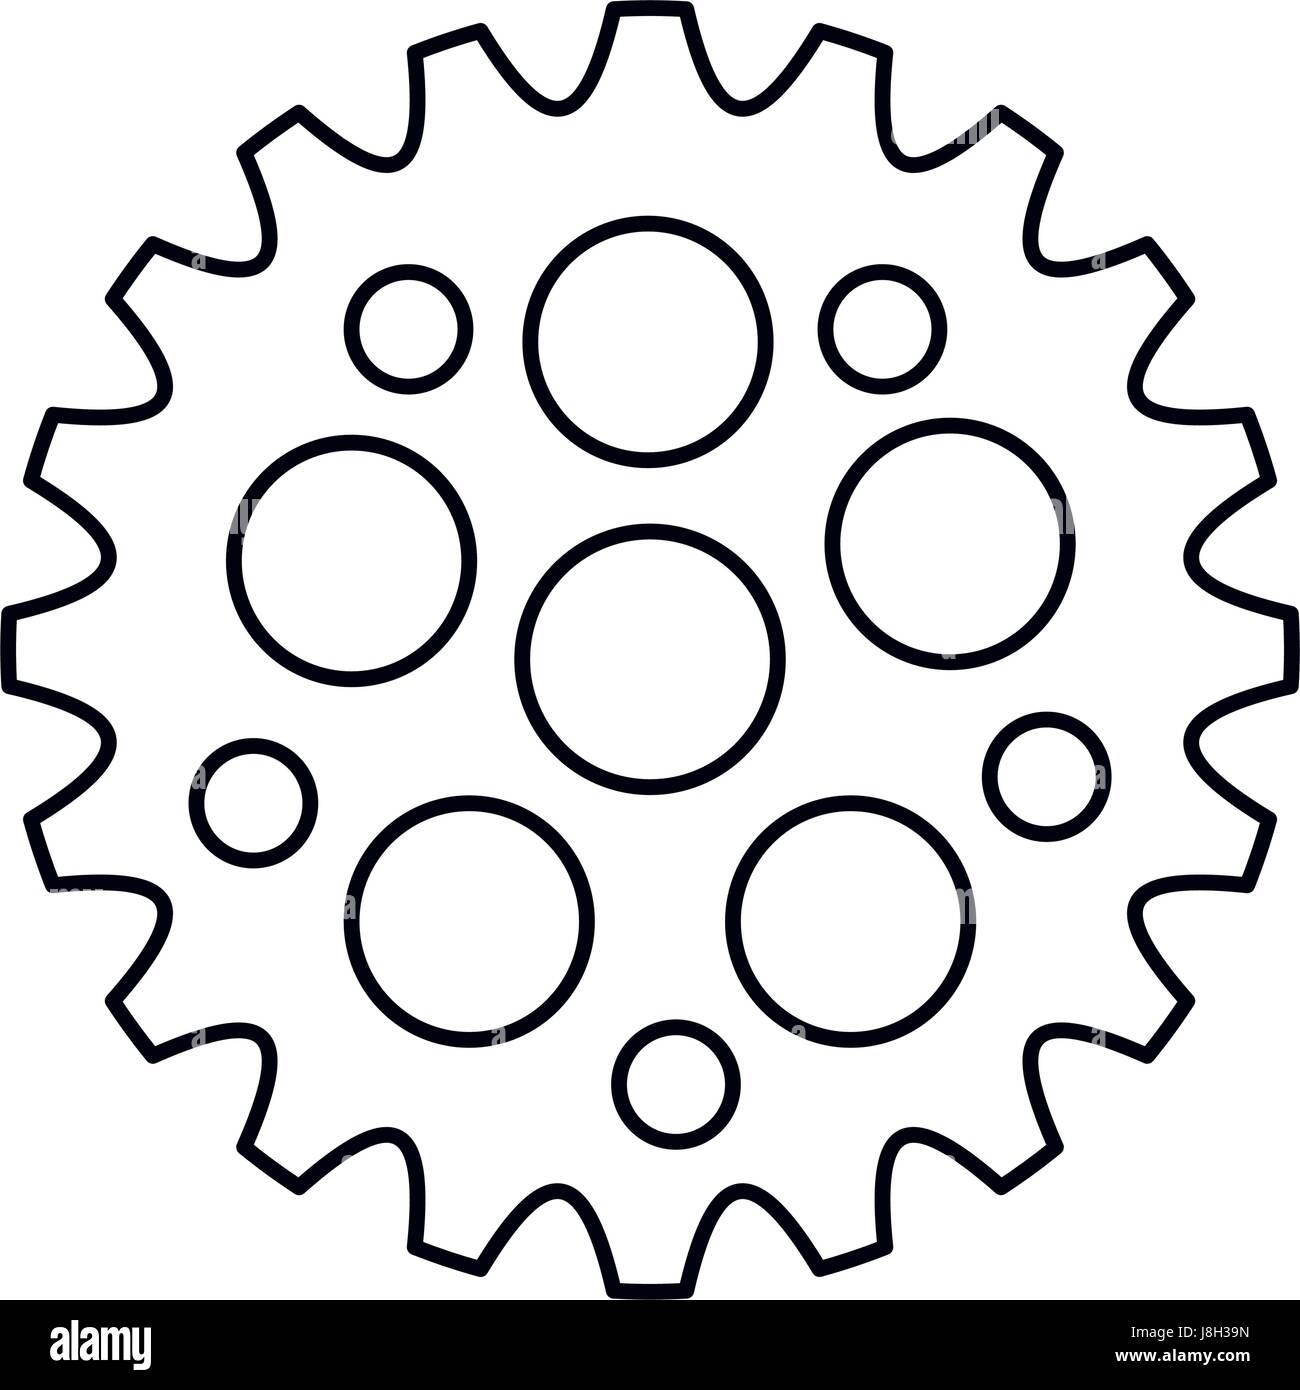 bike gears design - Stock Image